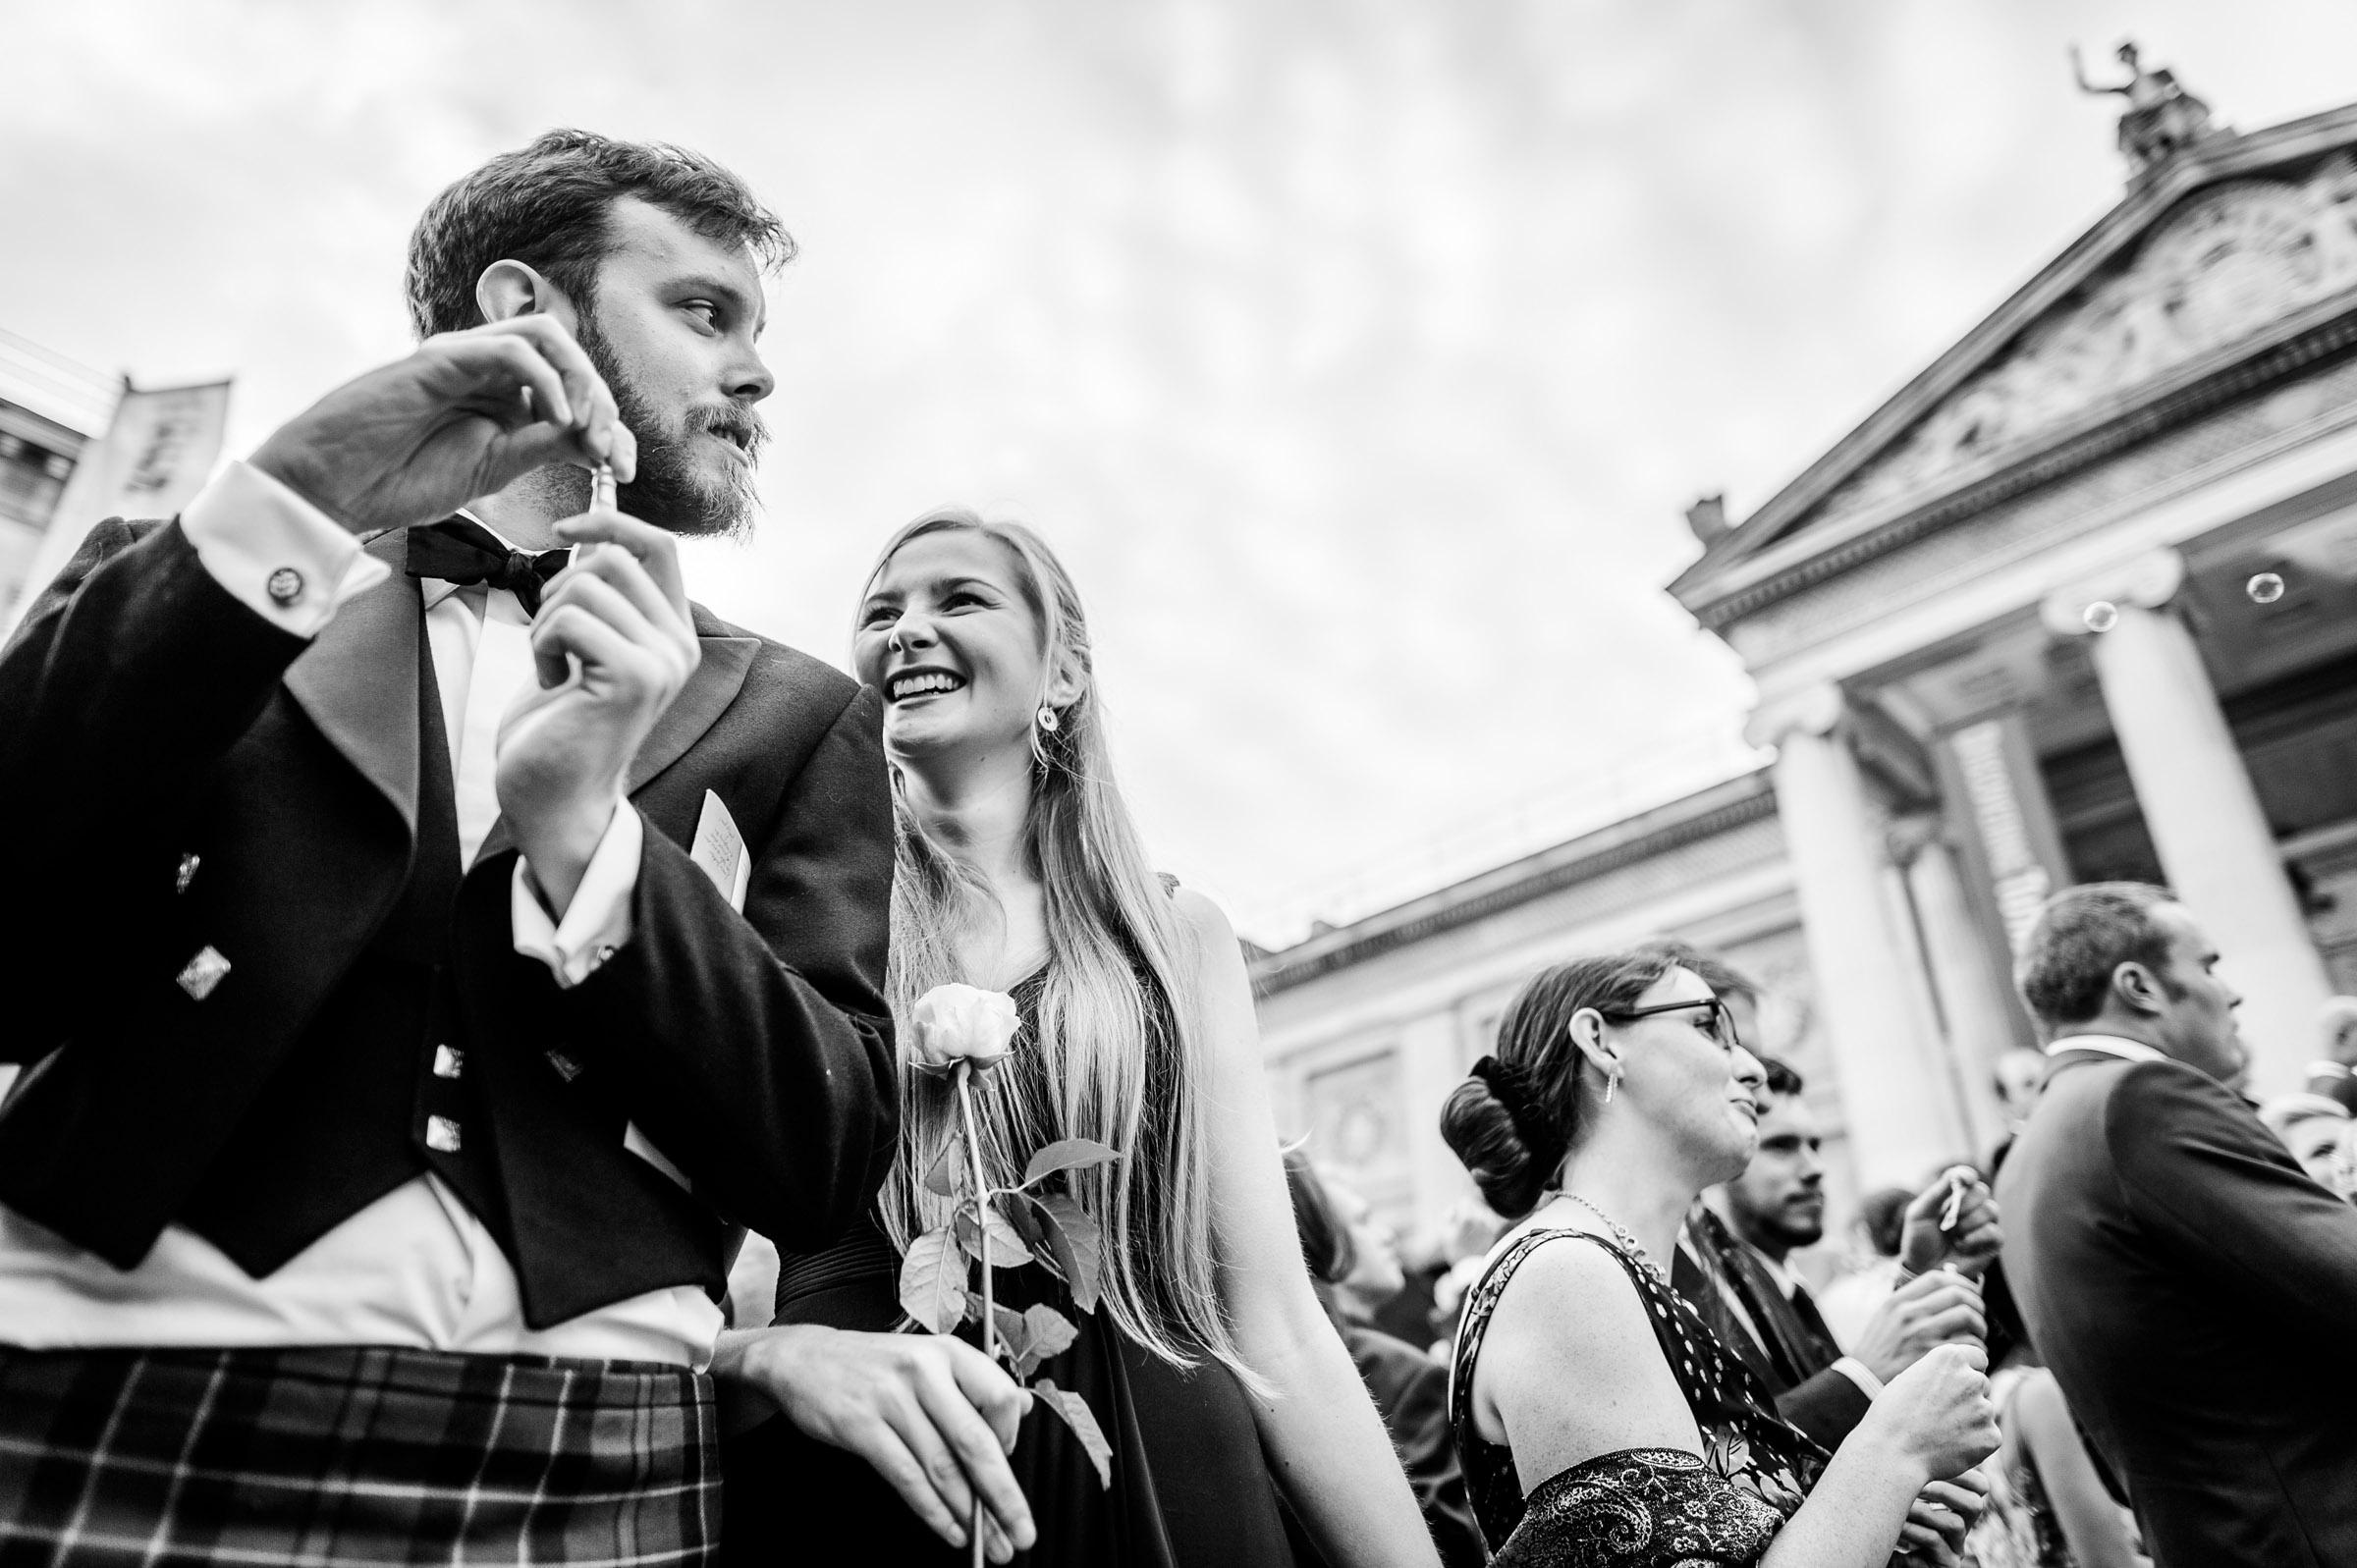 Ashmolean-Museum-Wedding-Pictures-0044.jpg